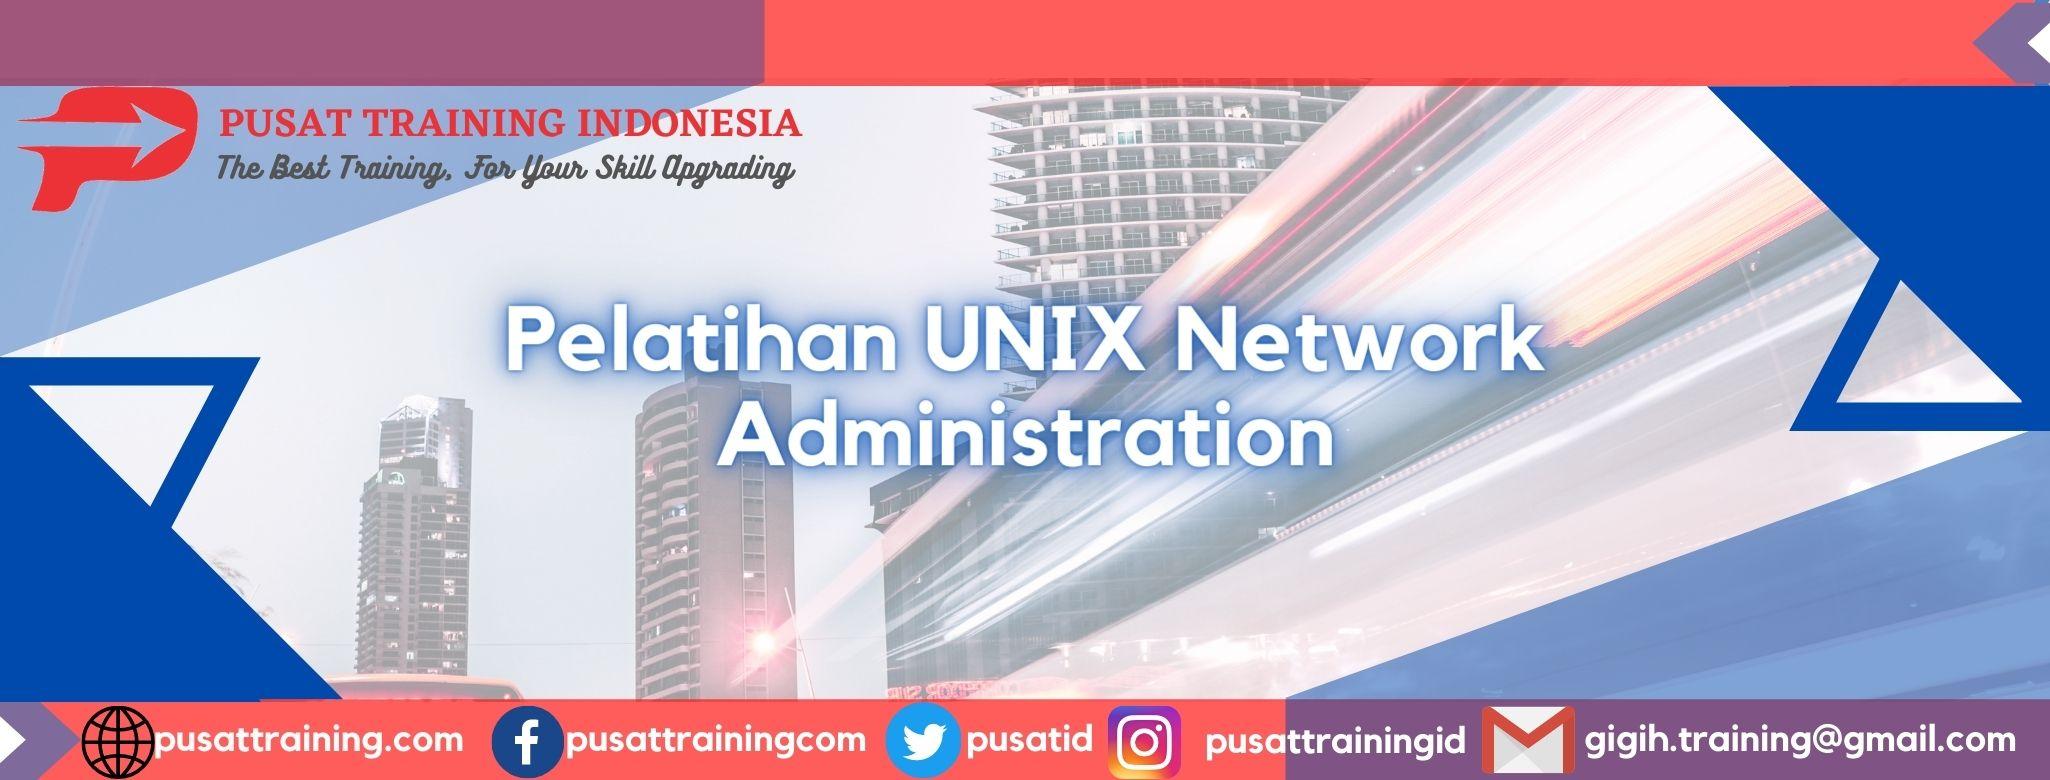 pelatihan-unix-network-administration